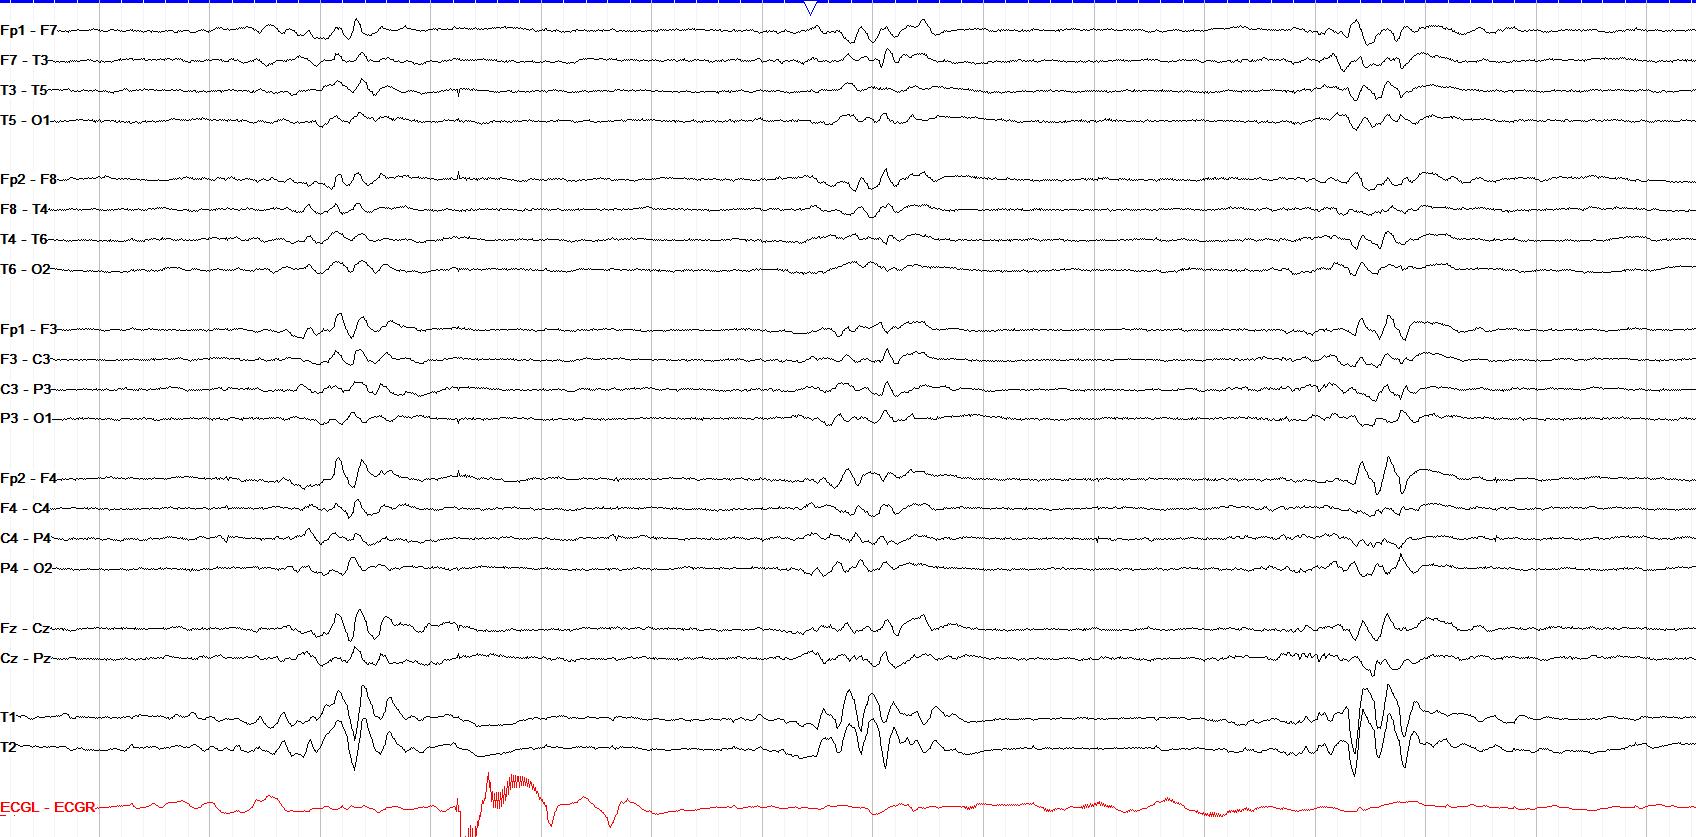 photic driving 9 Hz